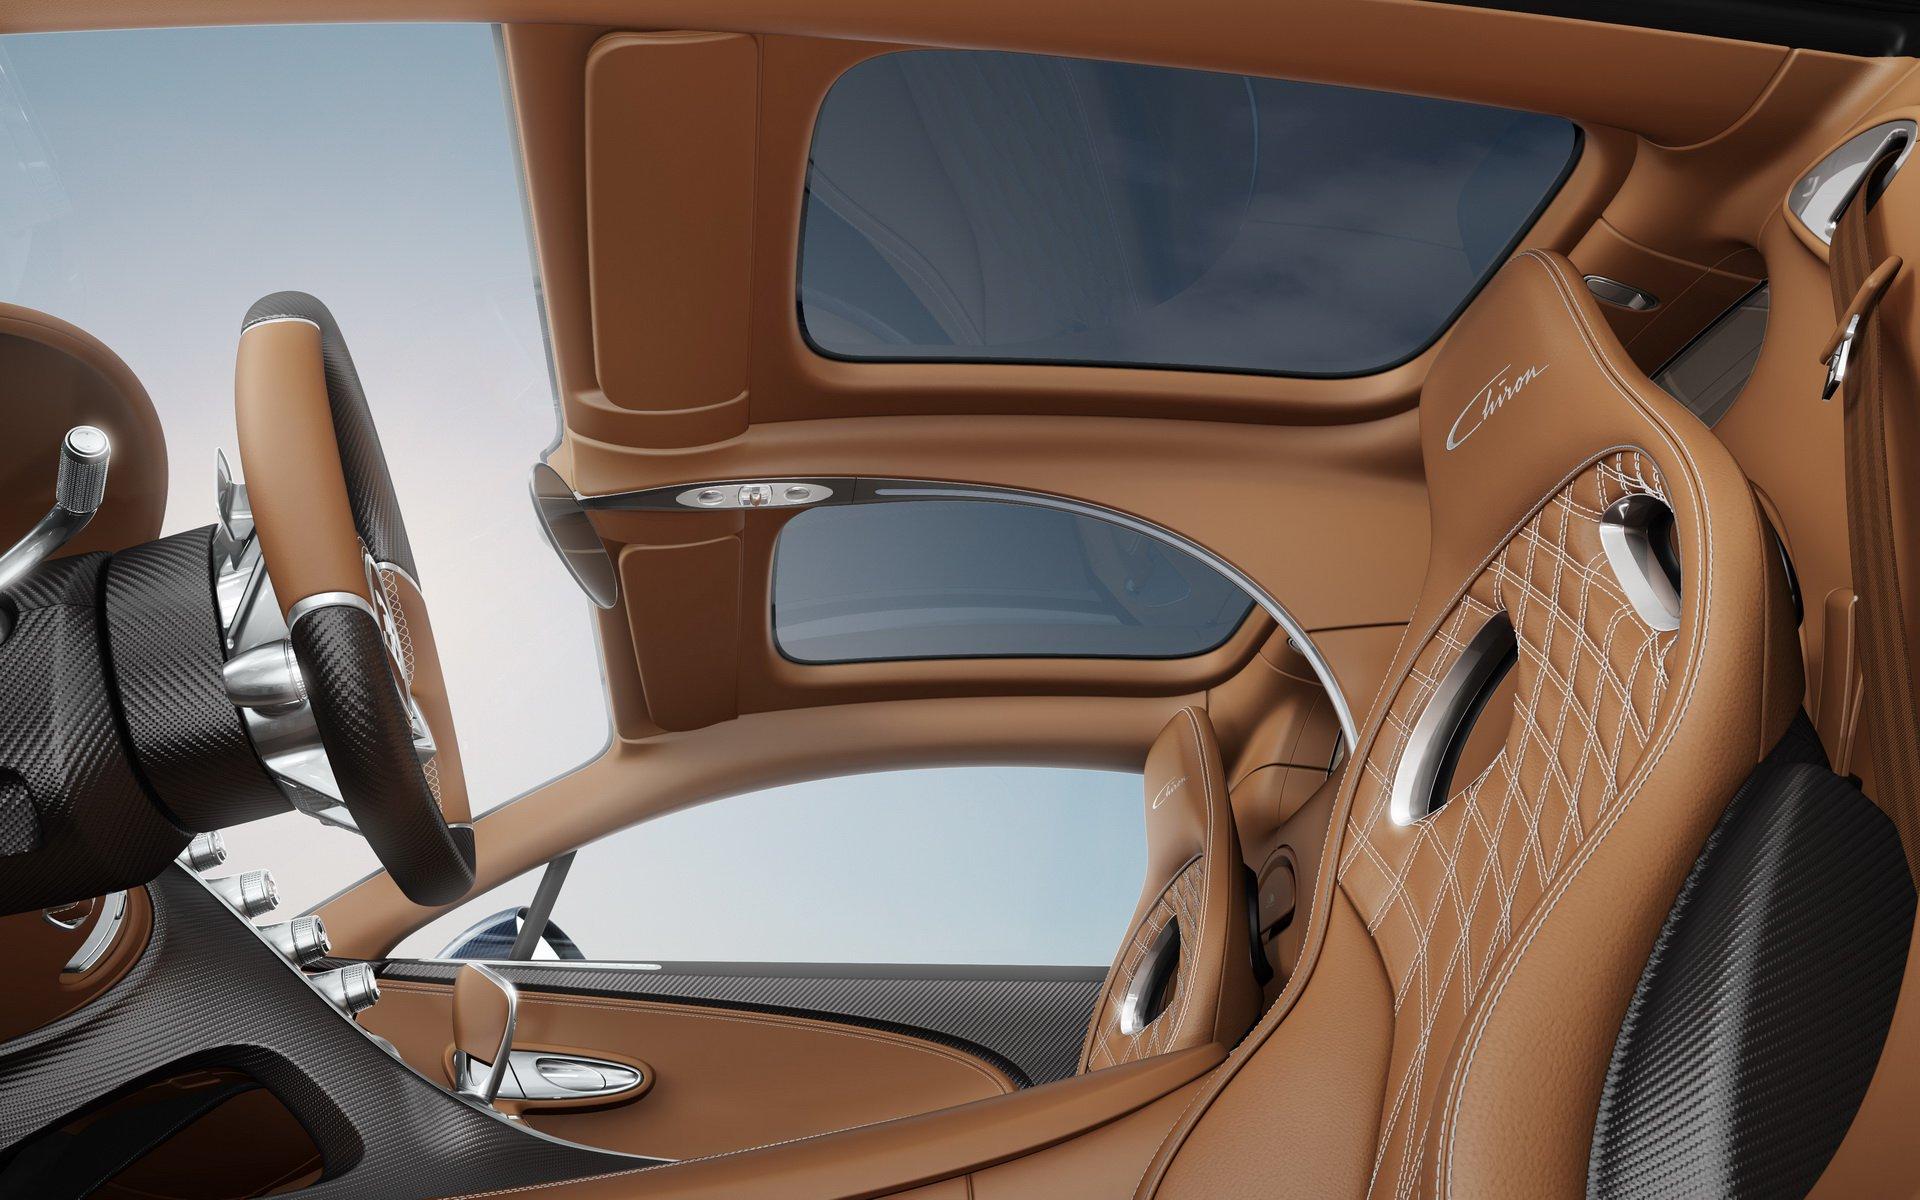 Bugatti Chiron Sky View glass roof (3)